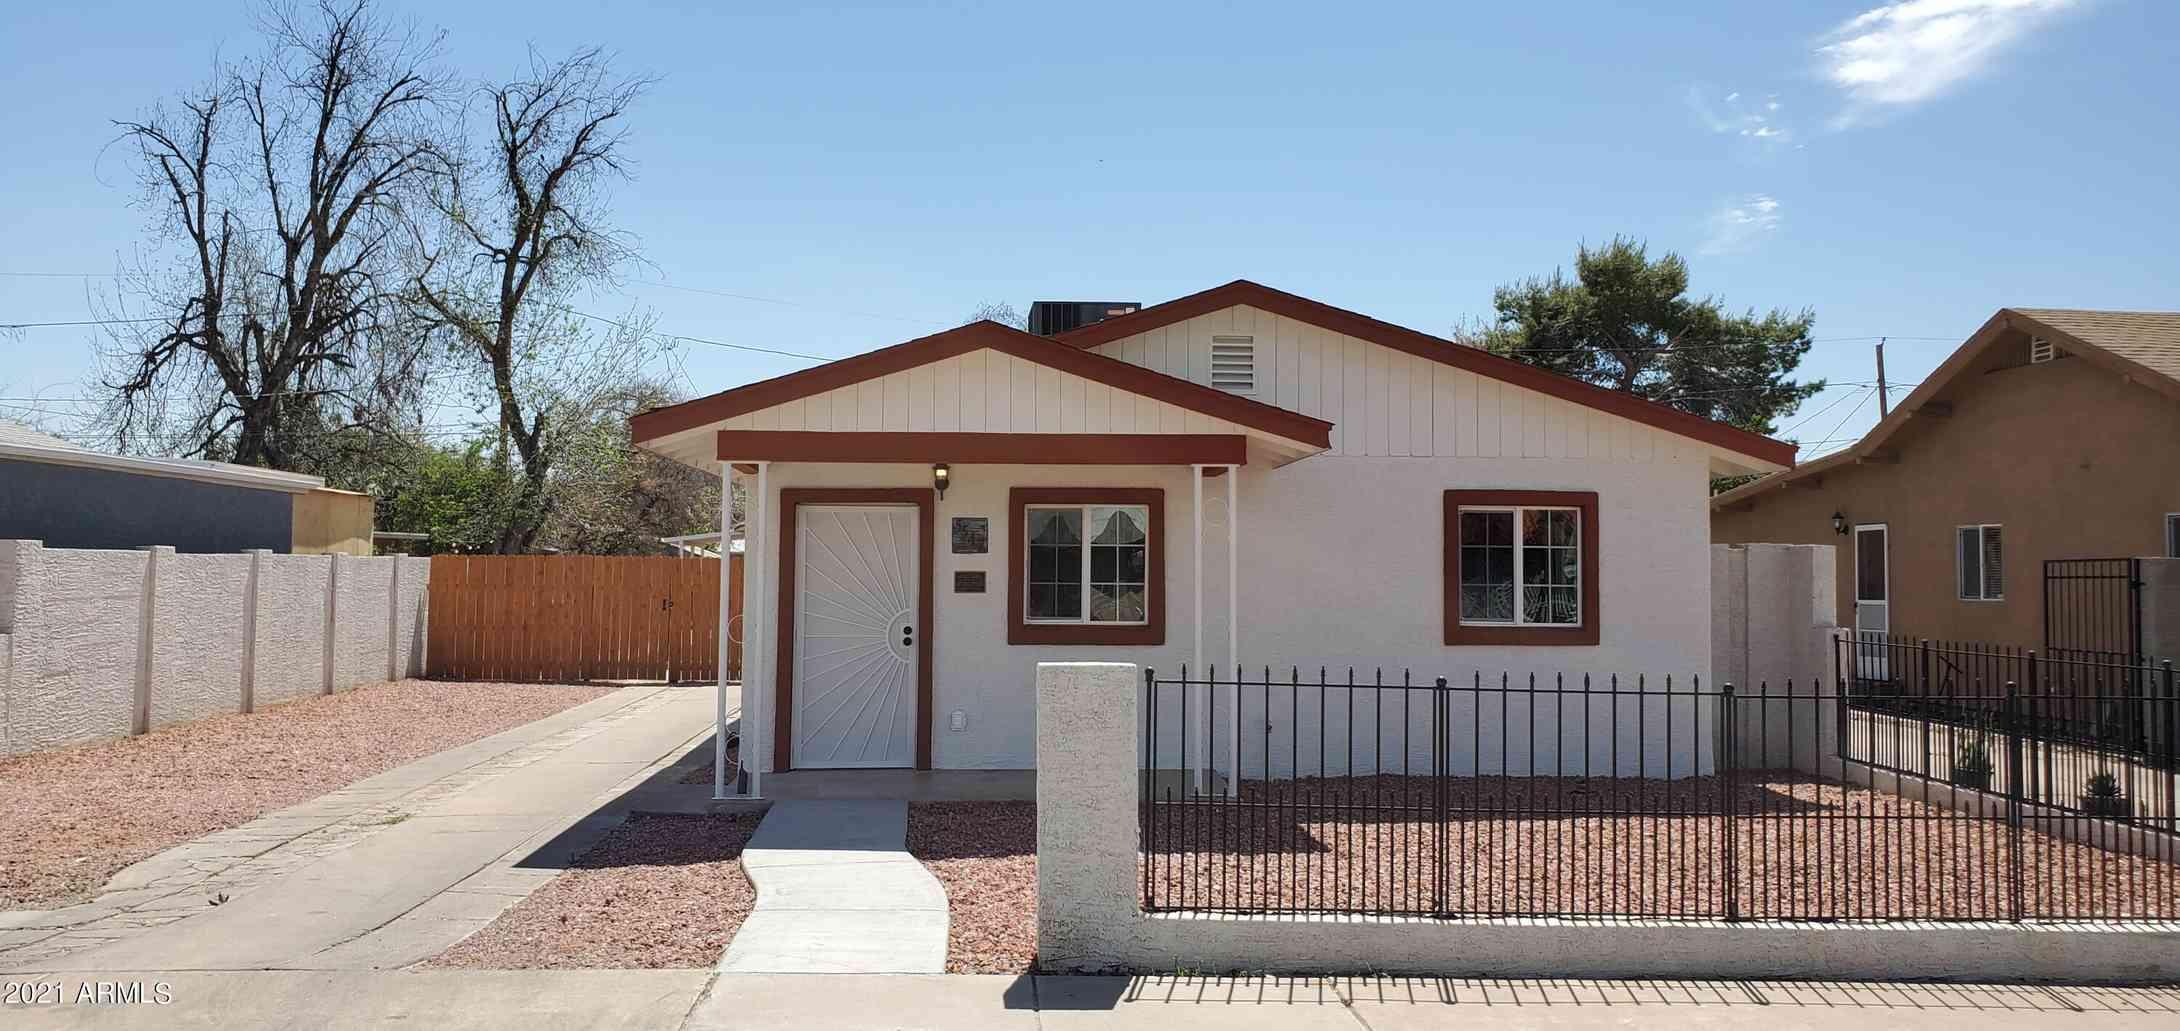 5547 W STATE Avenue, Glendale, AZ, 85301,